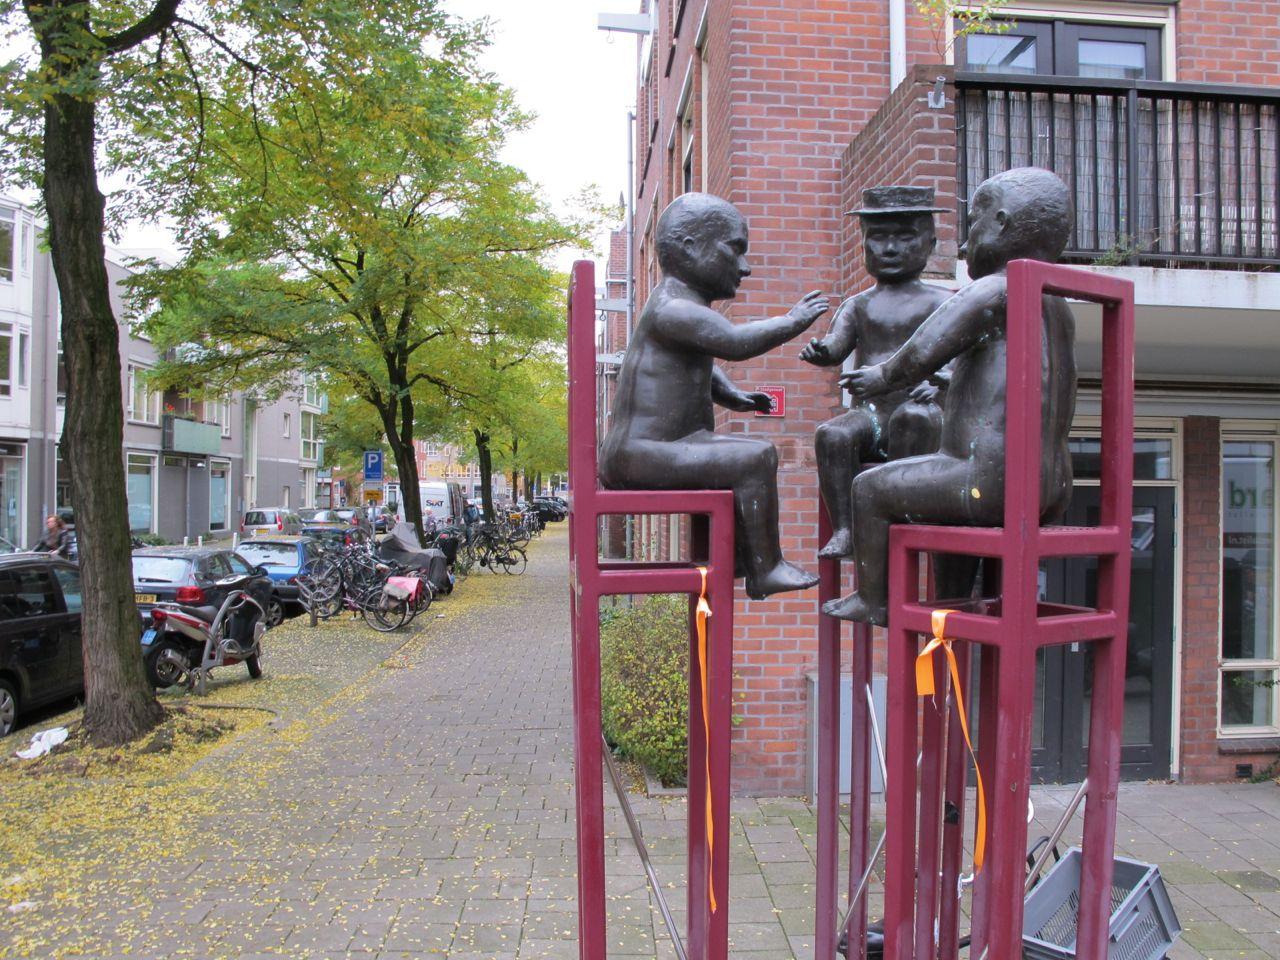 Three men in conversation, at Ten Katestraat, Amsterdam